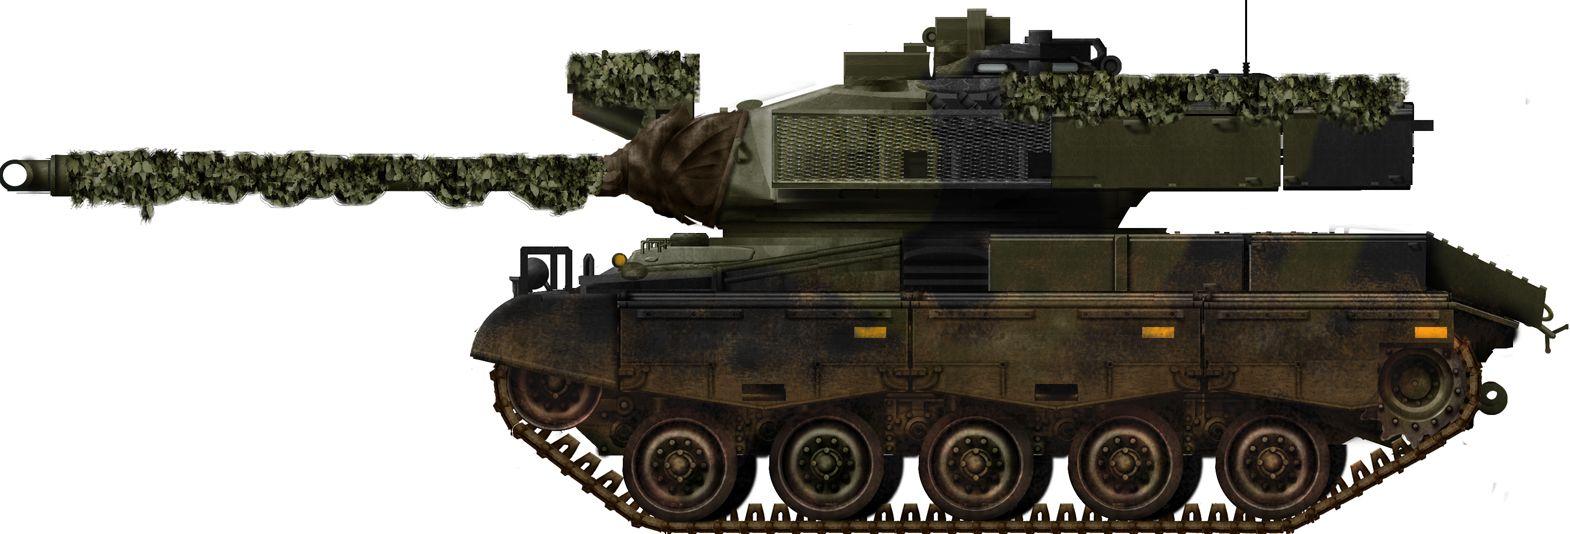 The M41 Walker Bulldog was the 1950s successor of the ww2